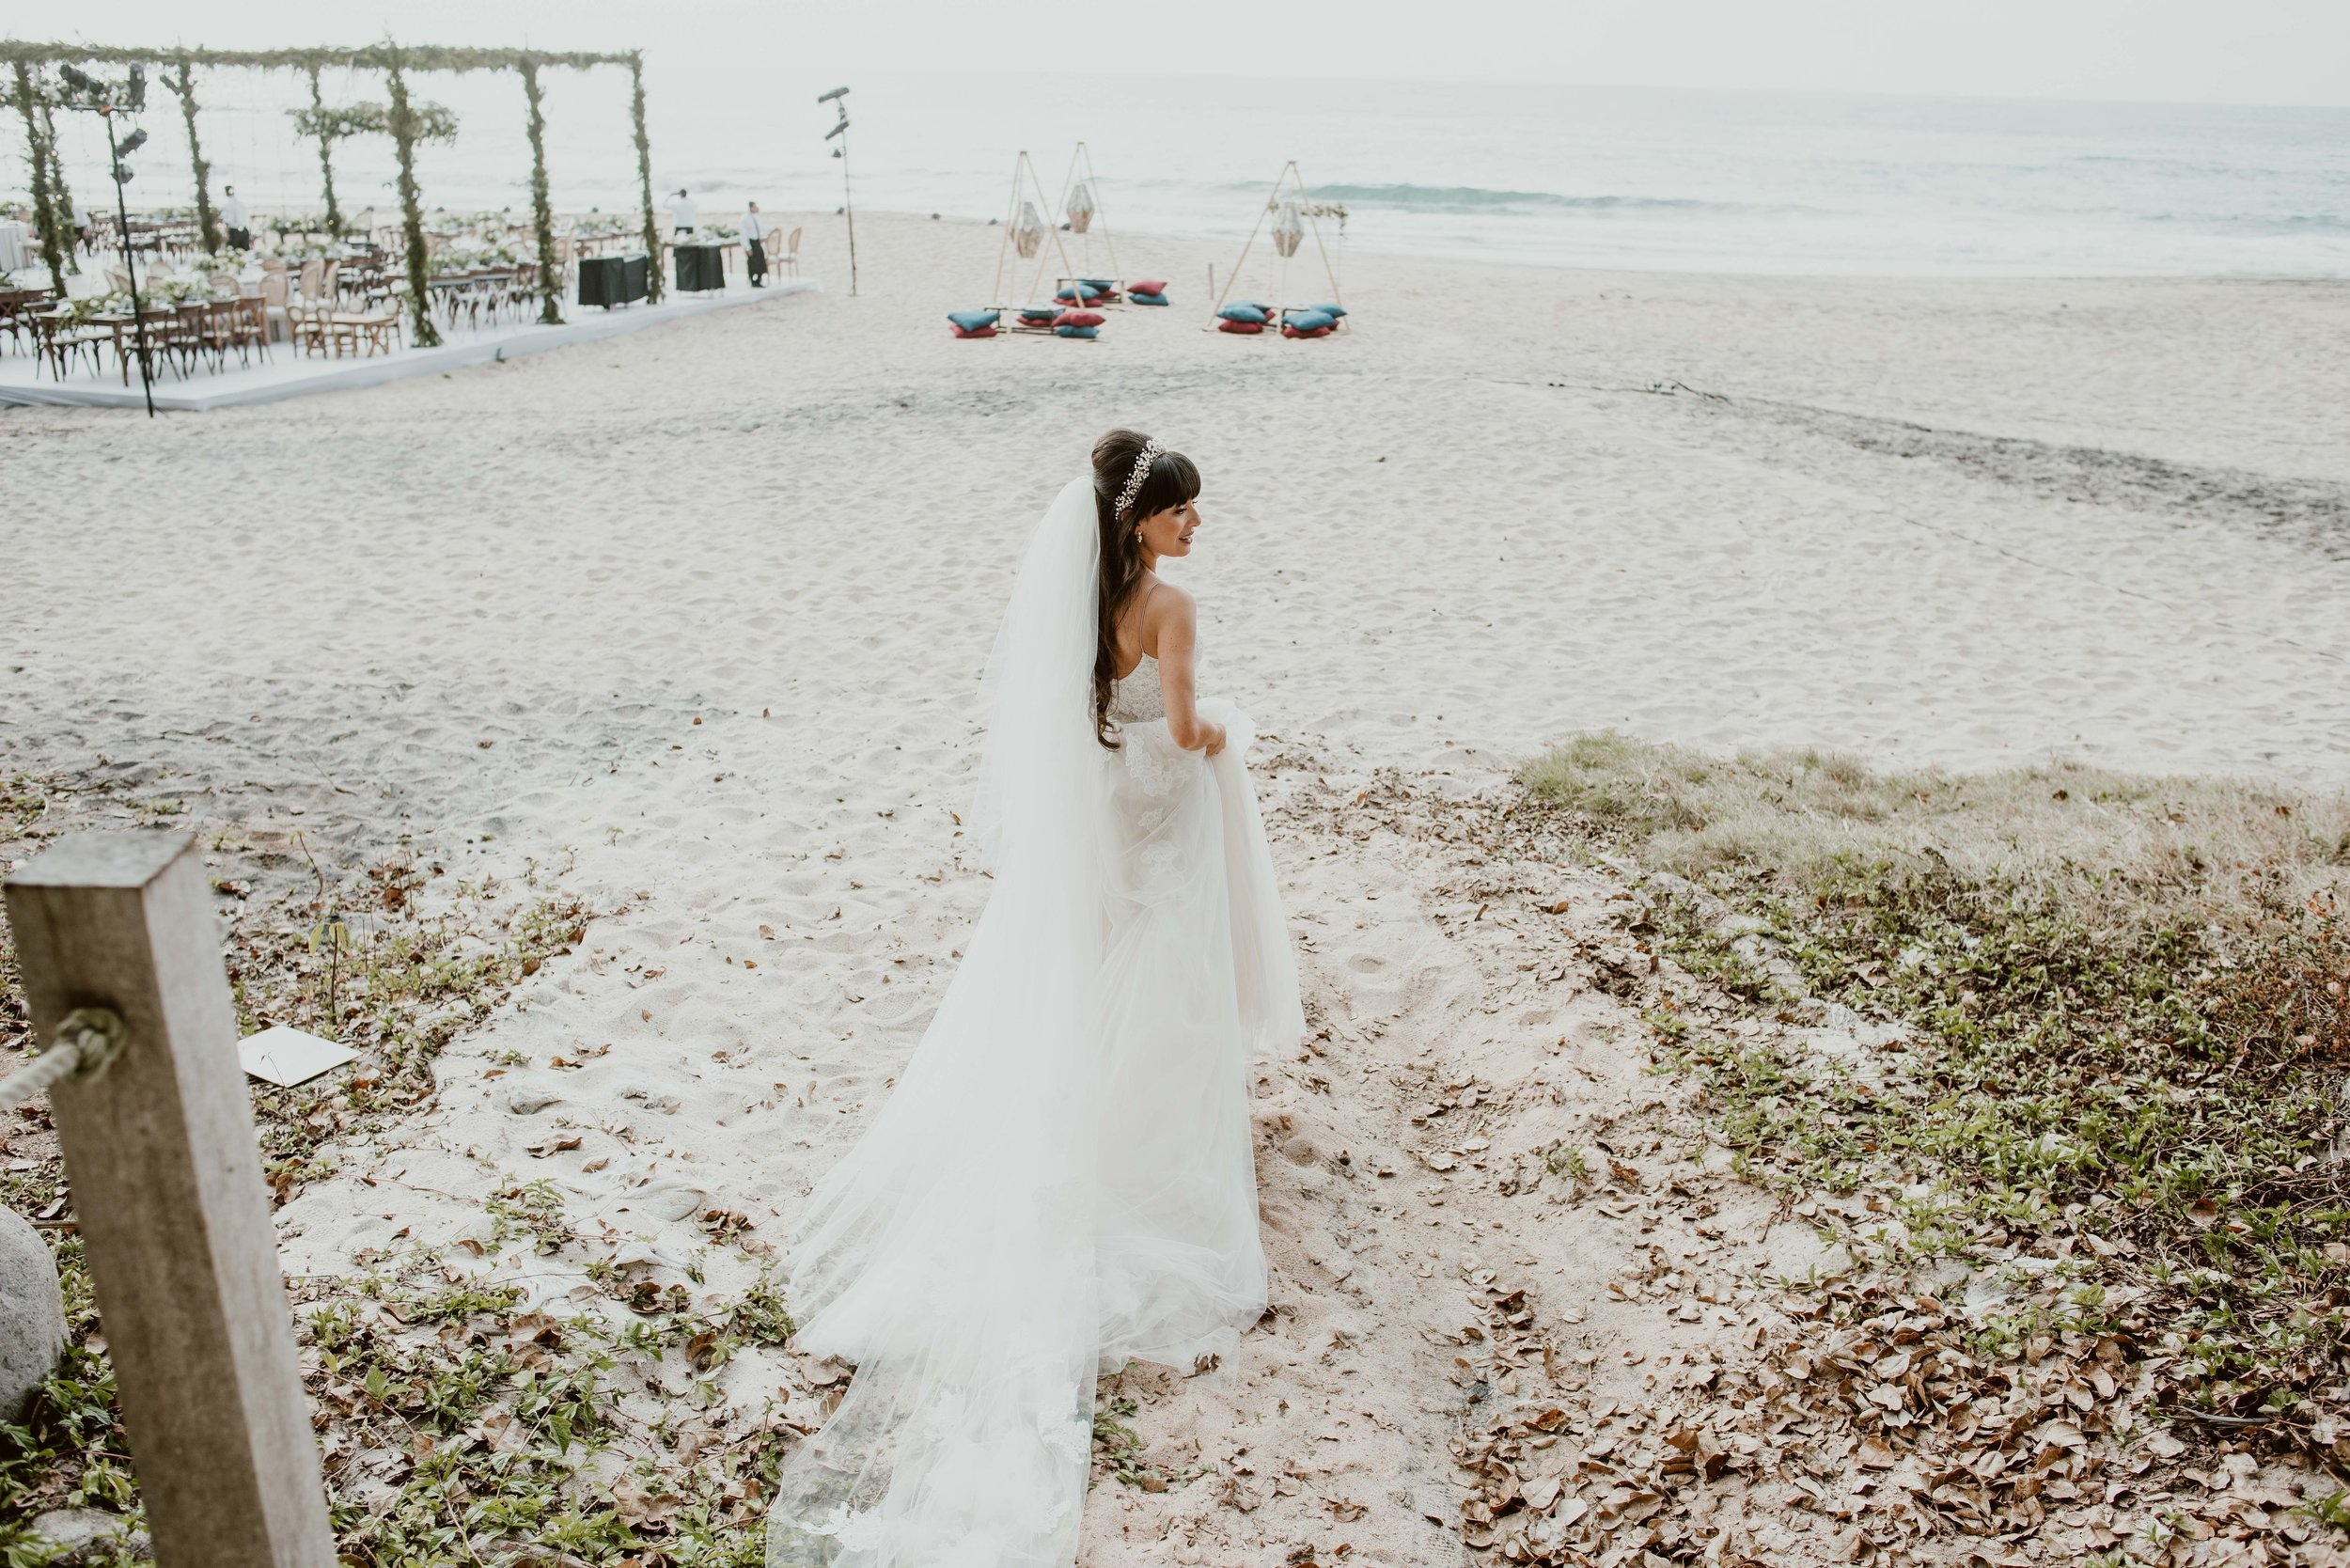 Mariana+Blake Sayulita Wedding-203.jpg